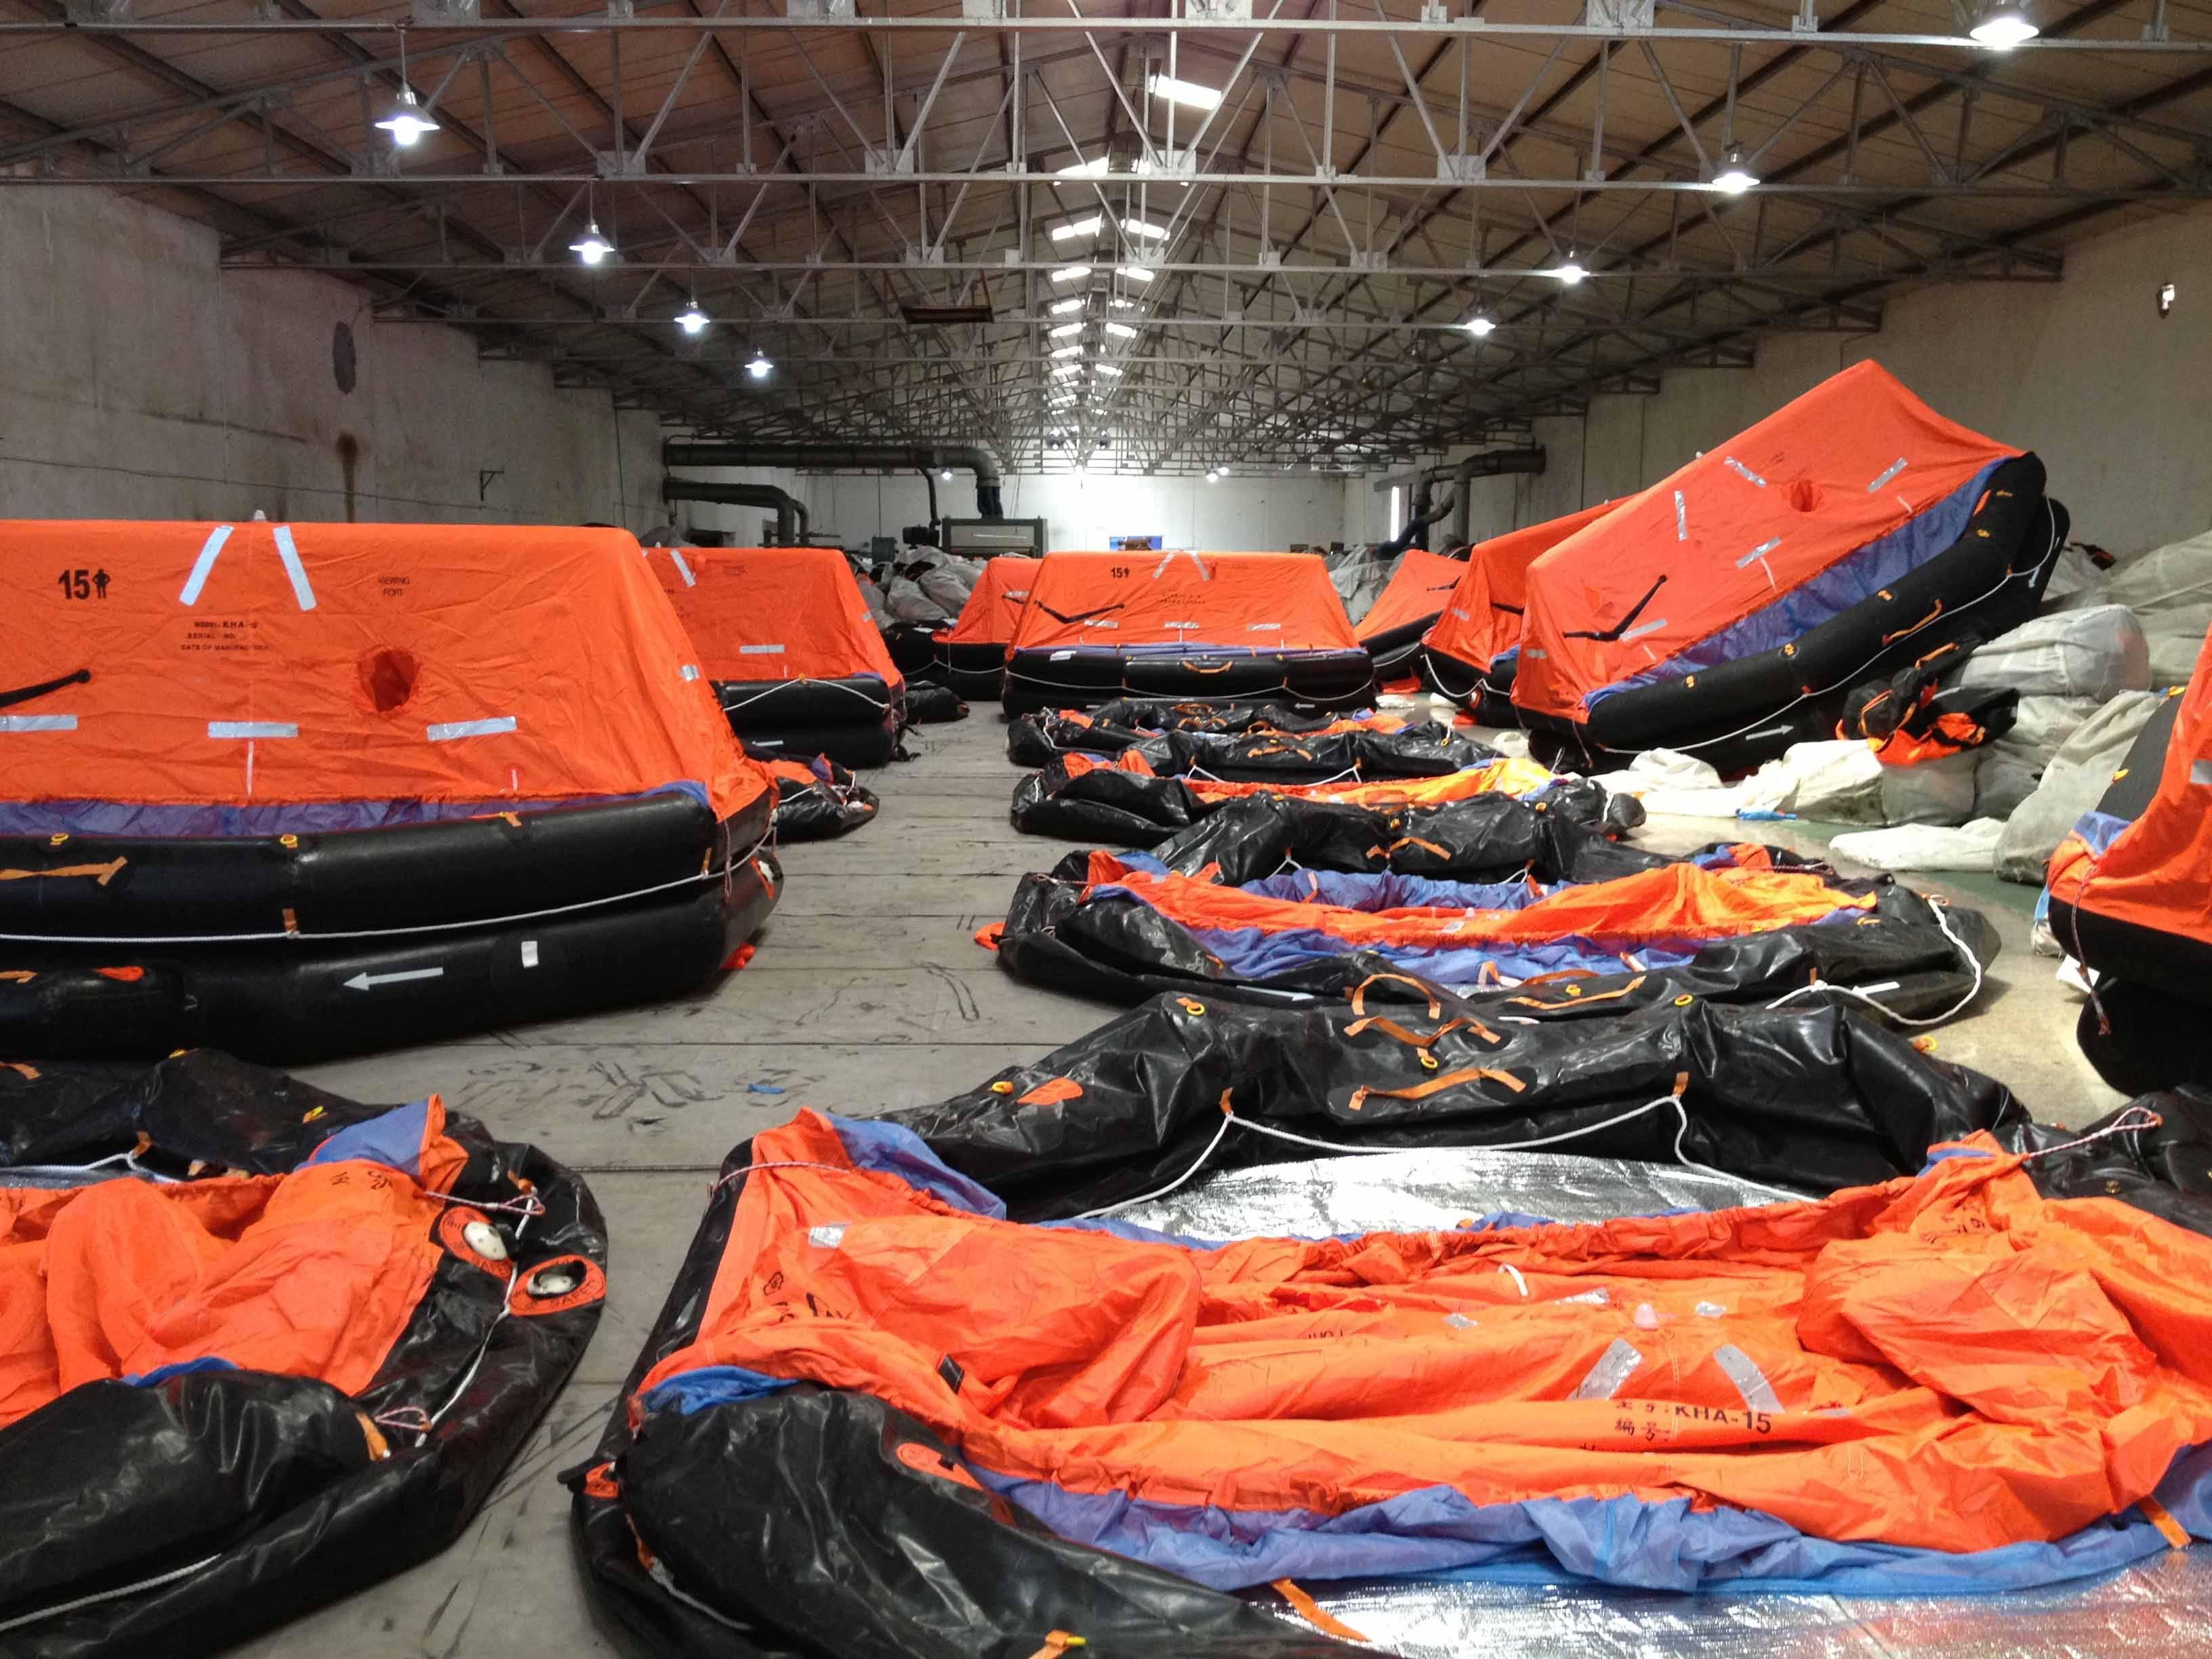 6 Persons marine inflatable life raft, Solas emergency liferaft